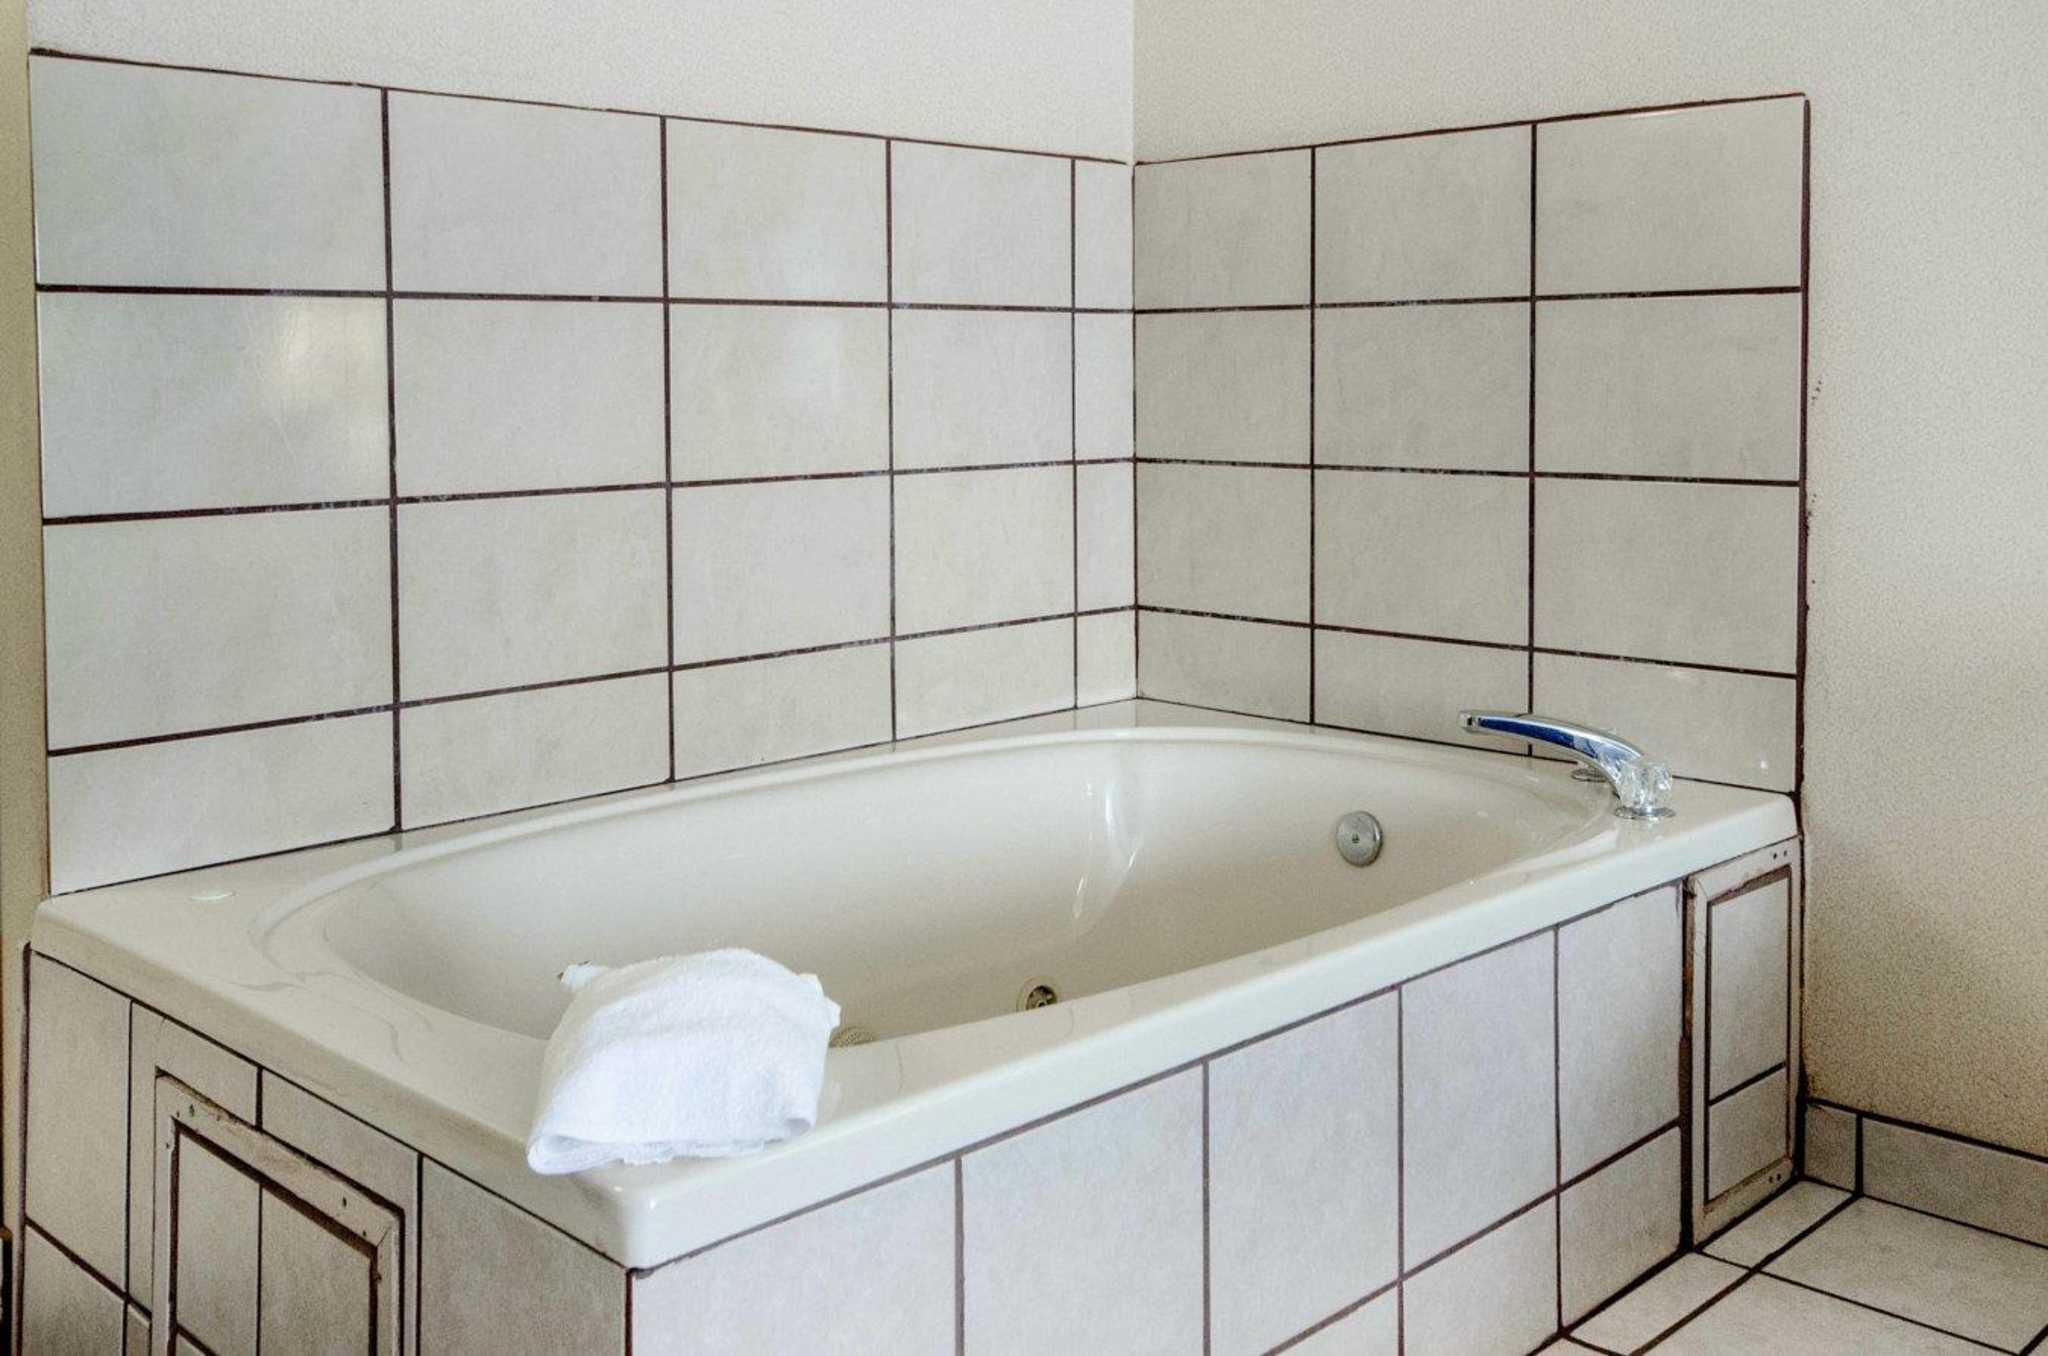 Comfort Inn Amp Suites Coupons La Grange Ky Near Me 8coupons